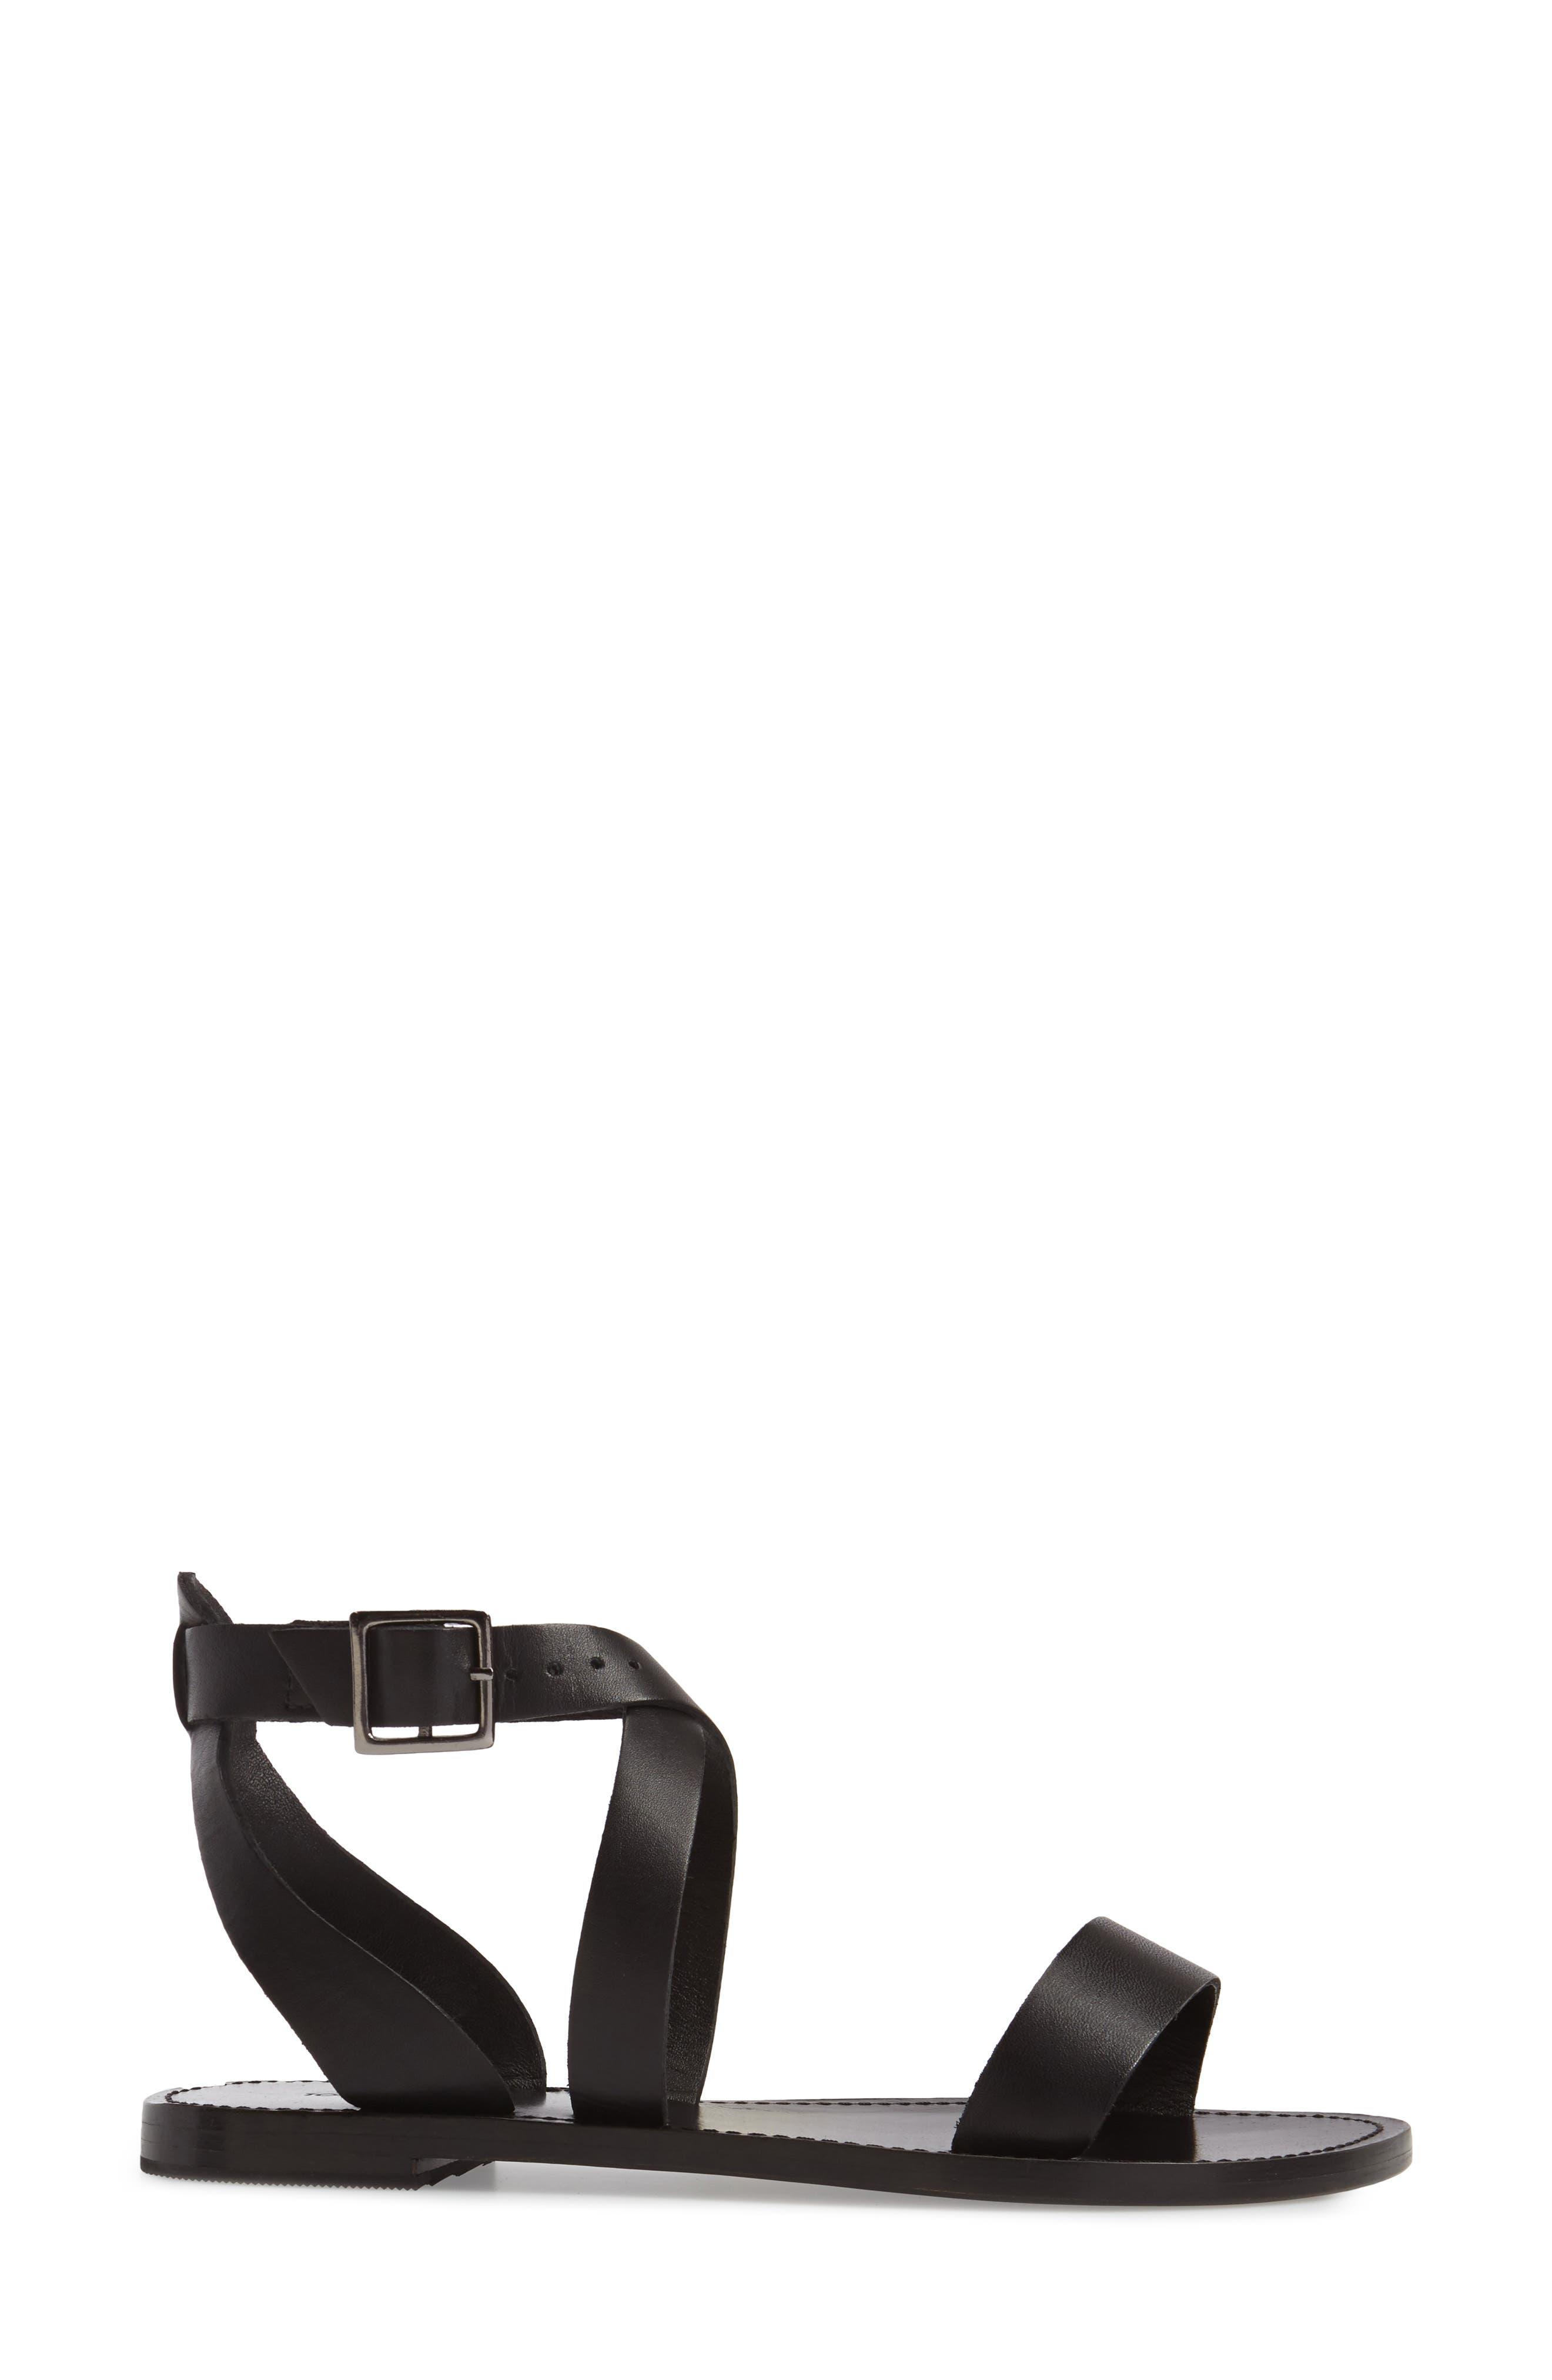 Flo Ankle Strap Sandal,                             Alternate thumbnail 3, color,                             001